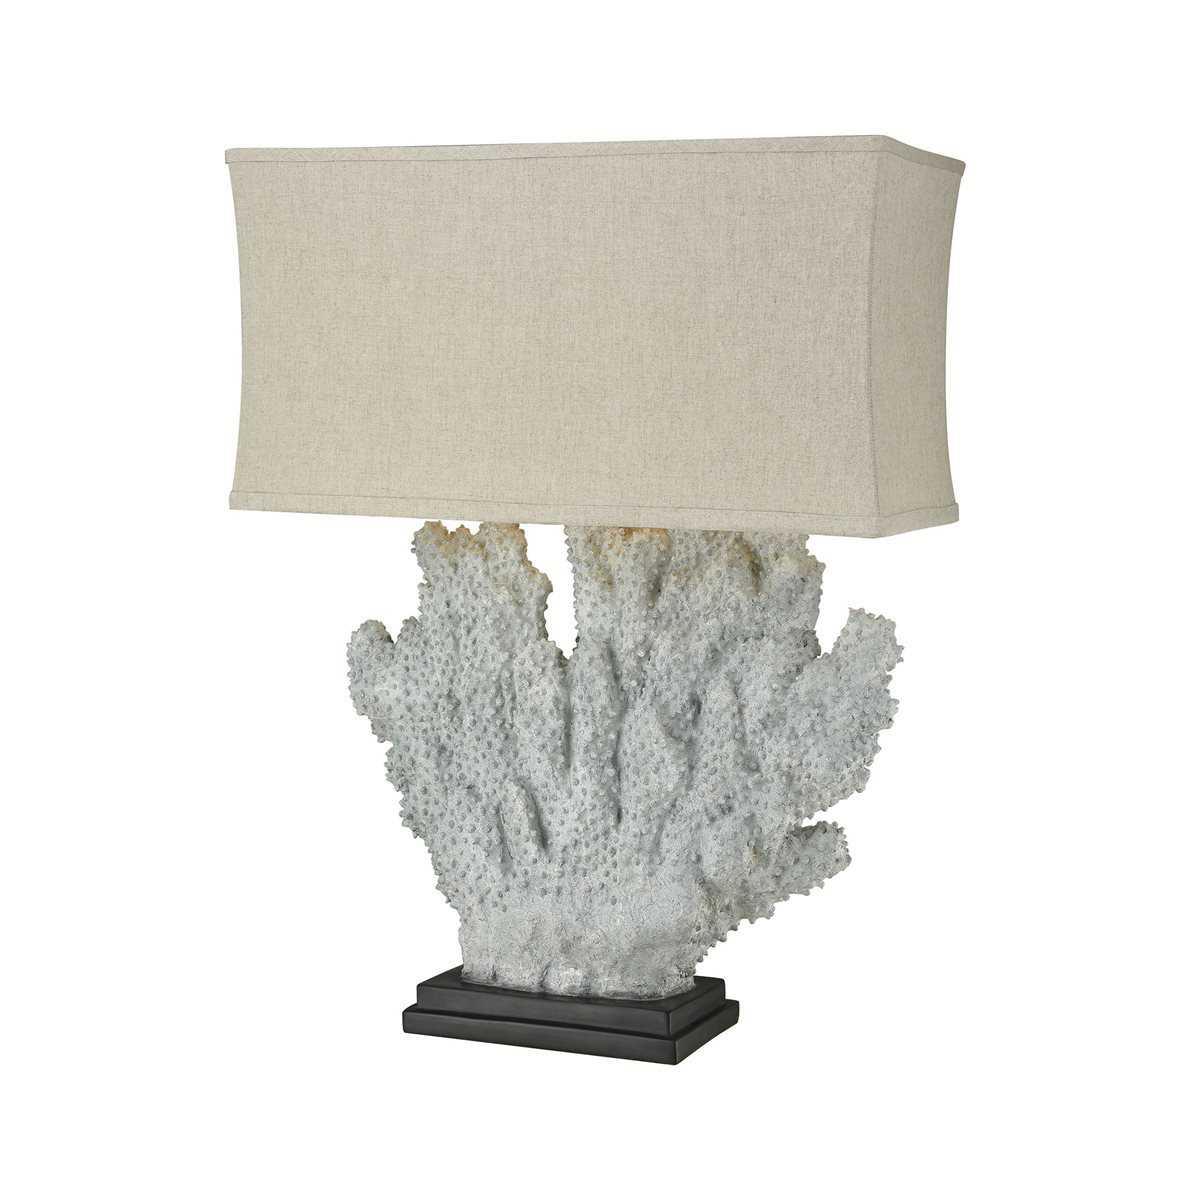 Menemsha outdoor table lamp